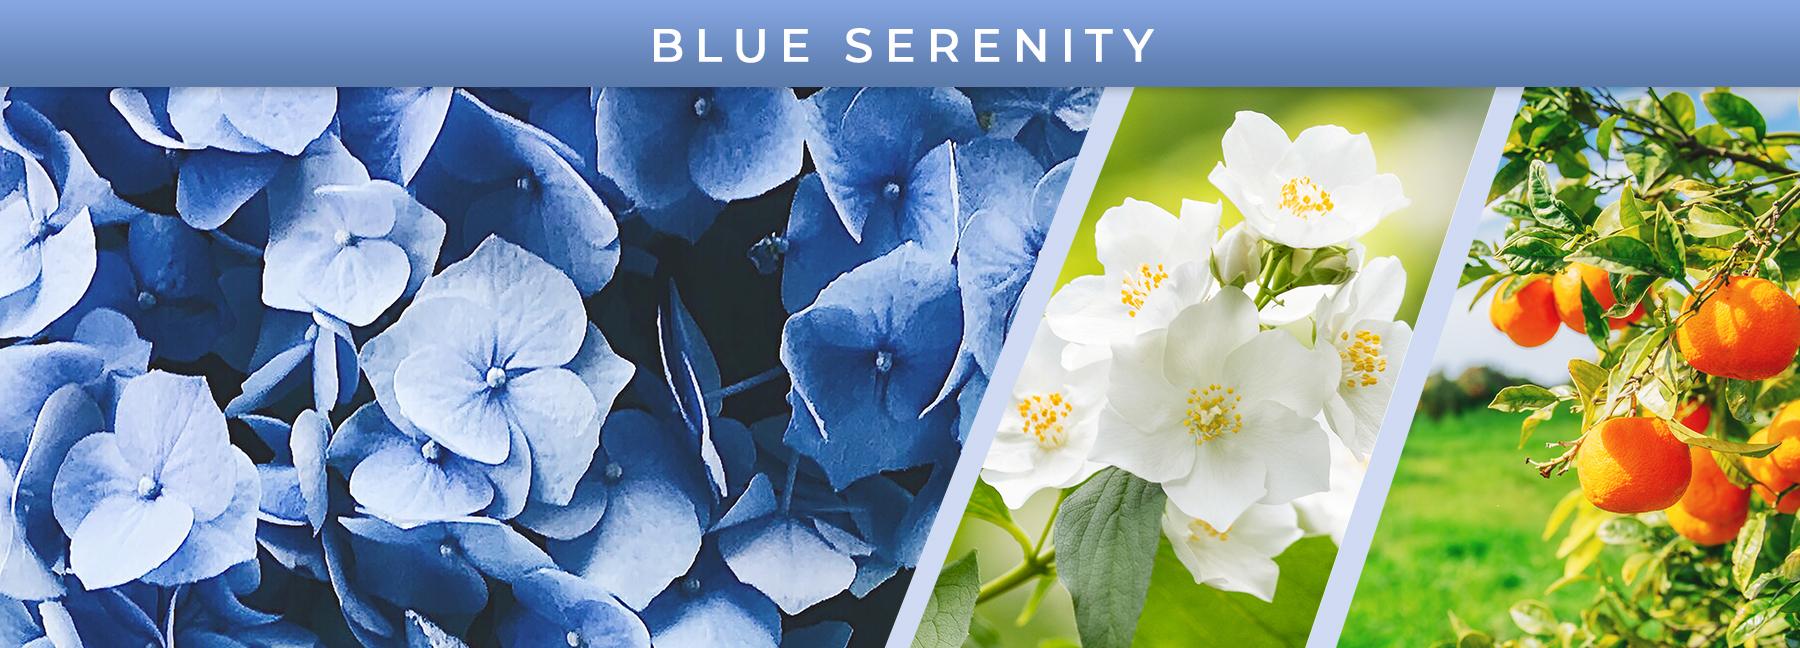 Blue Serenity™ fragrance elements